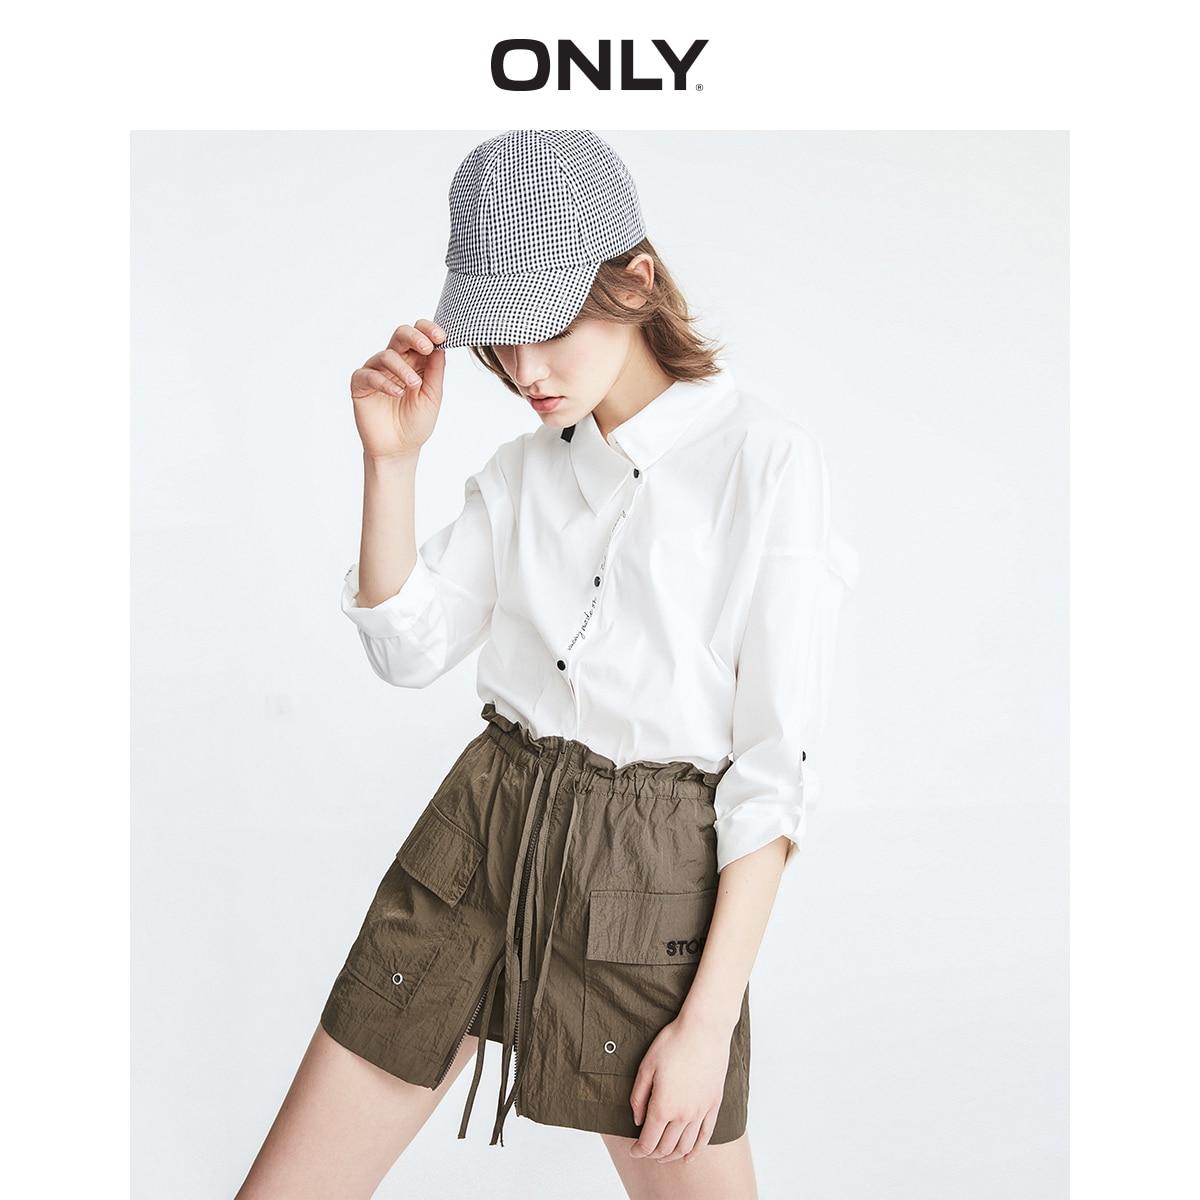 ONLY Women's  Loose Fit Asymmetrical Neckline Letter Print Long-sleeved Shirt | 119231508